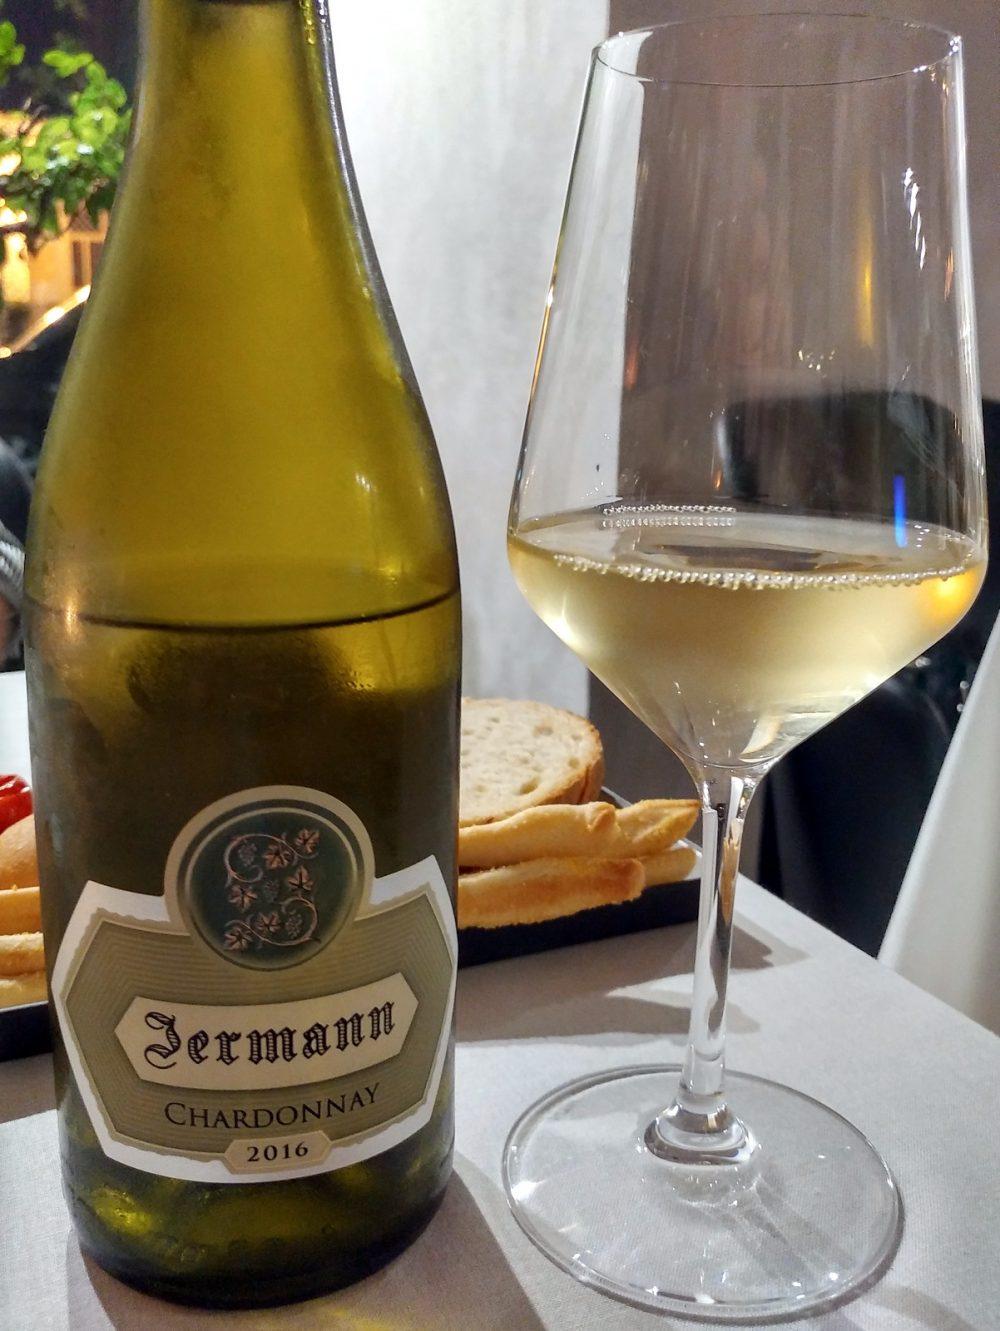 Ristorante 1Q84. Lo Chardonnay Jermann 2016